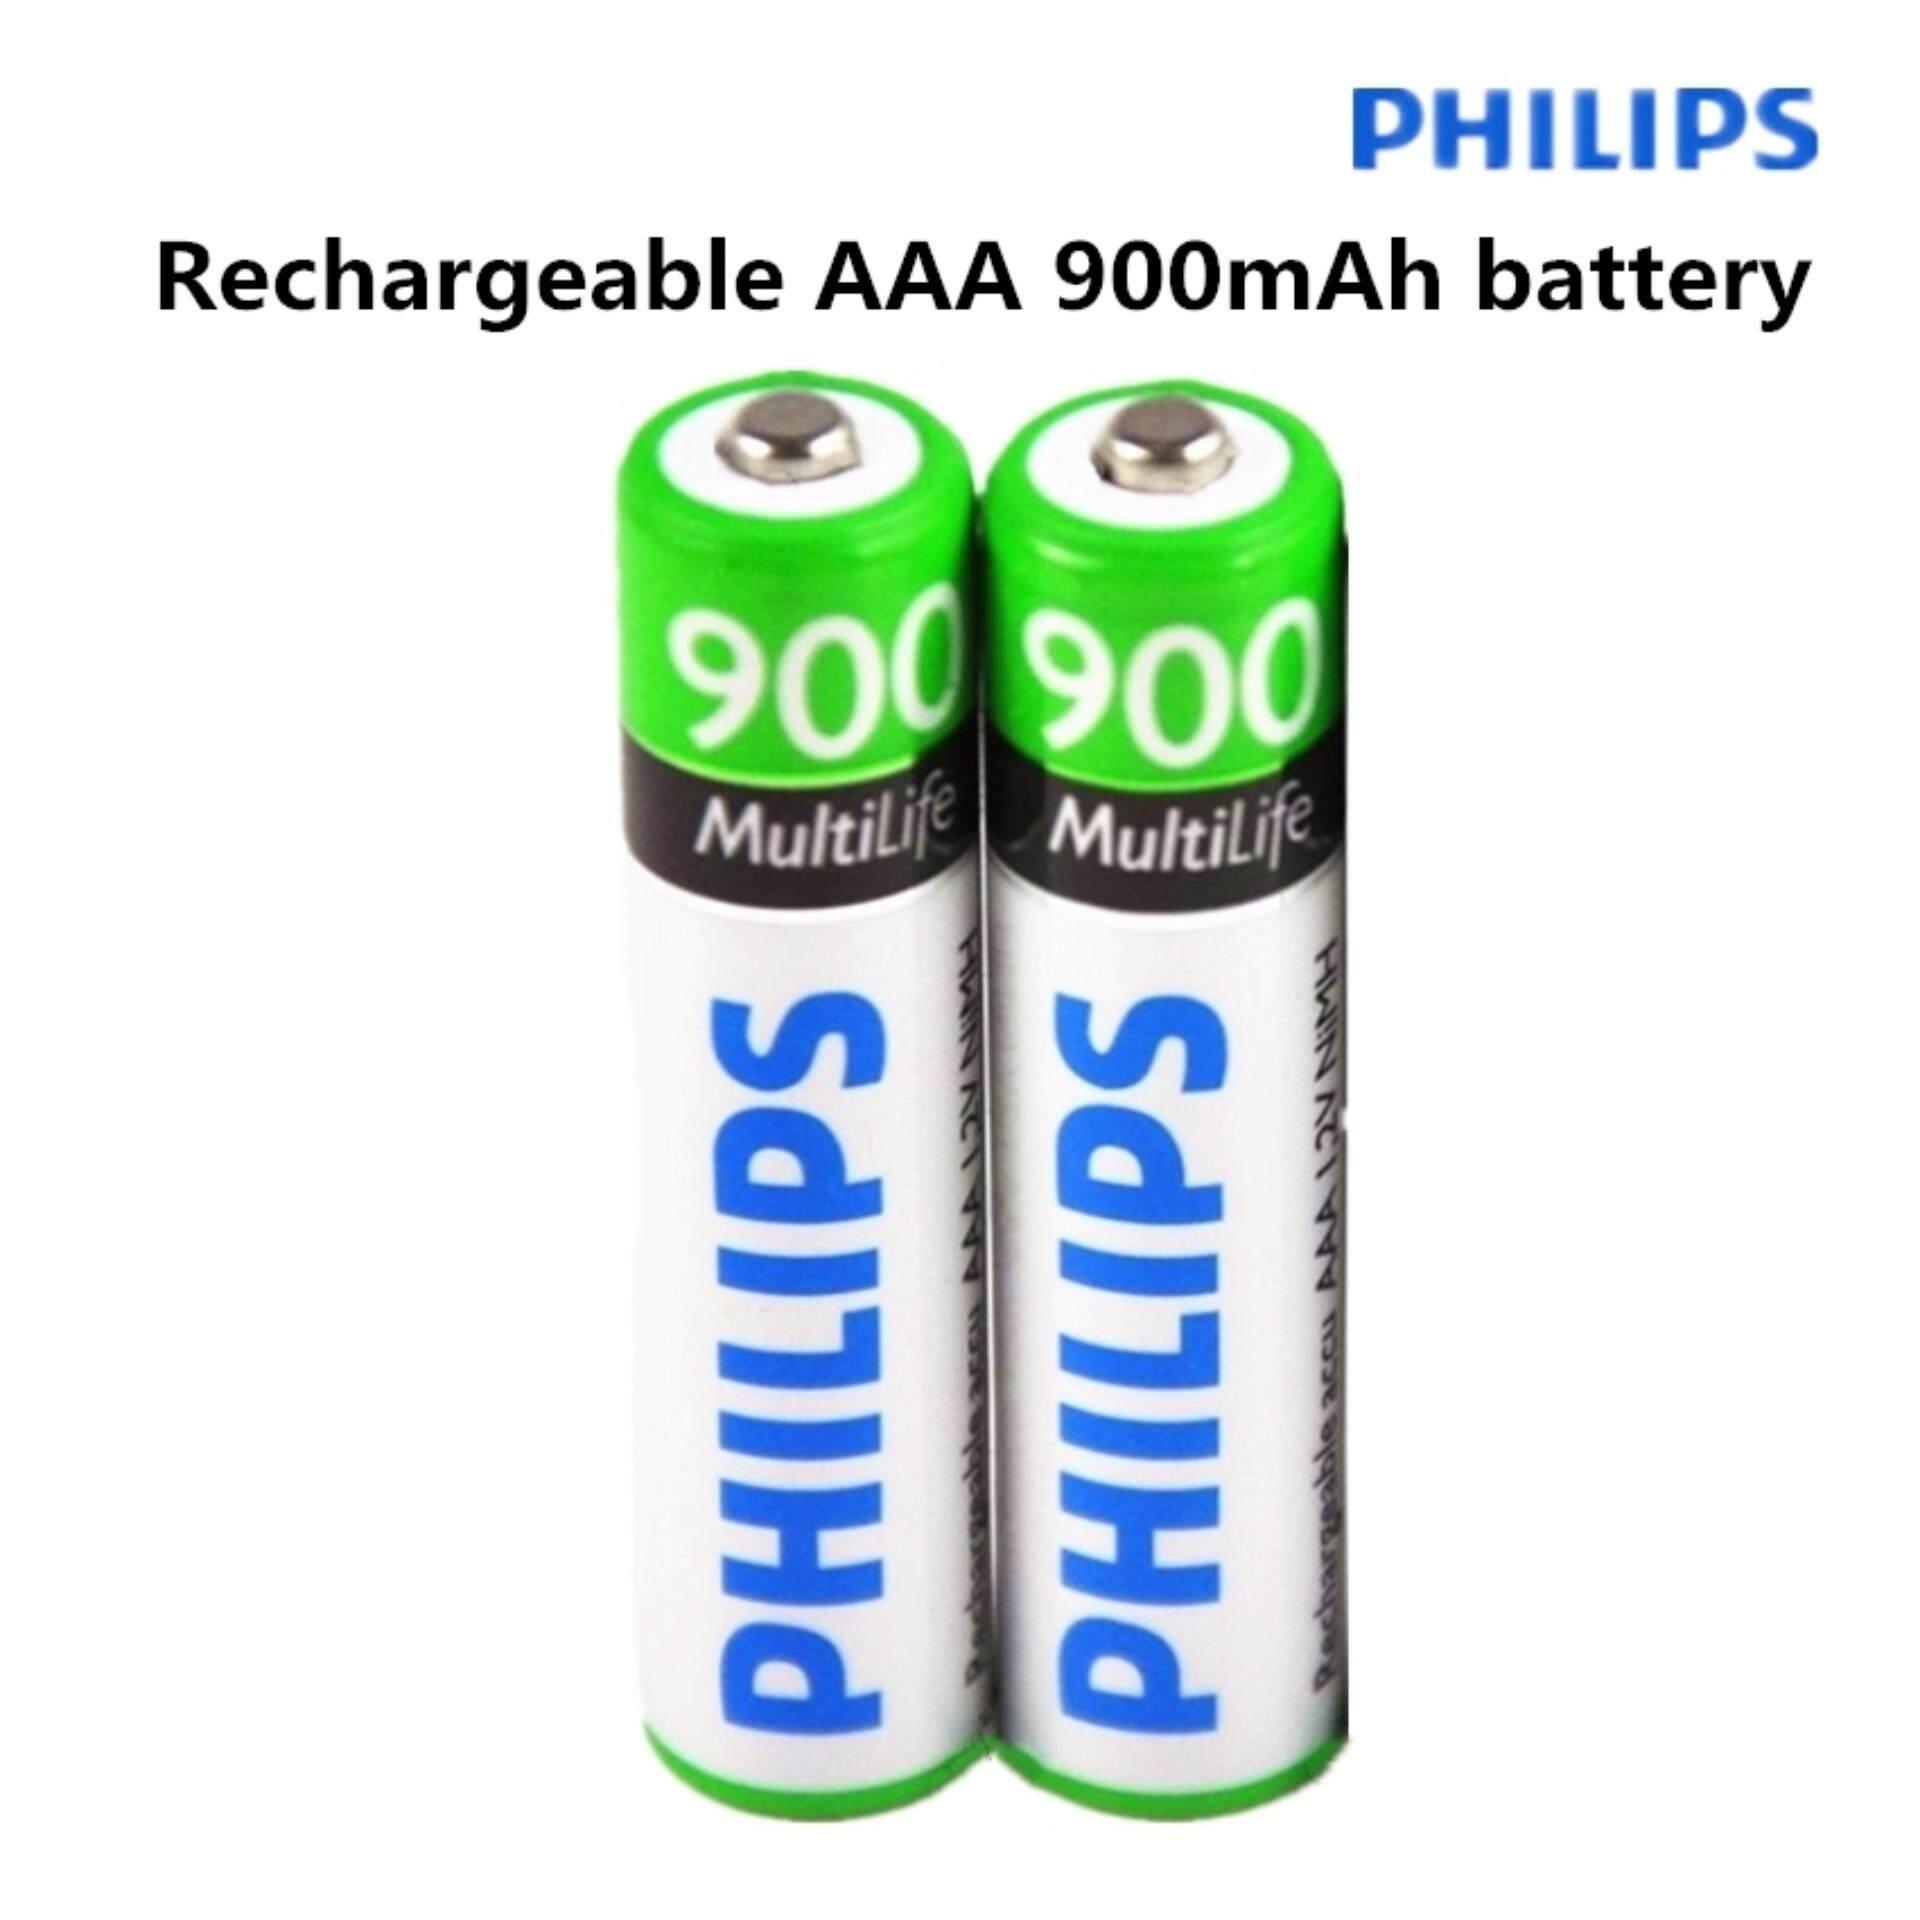 PHILIPS ถ่านชาร์จ AAA 900 mAh NIMH Rechargeable Battery 2 ก้อน